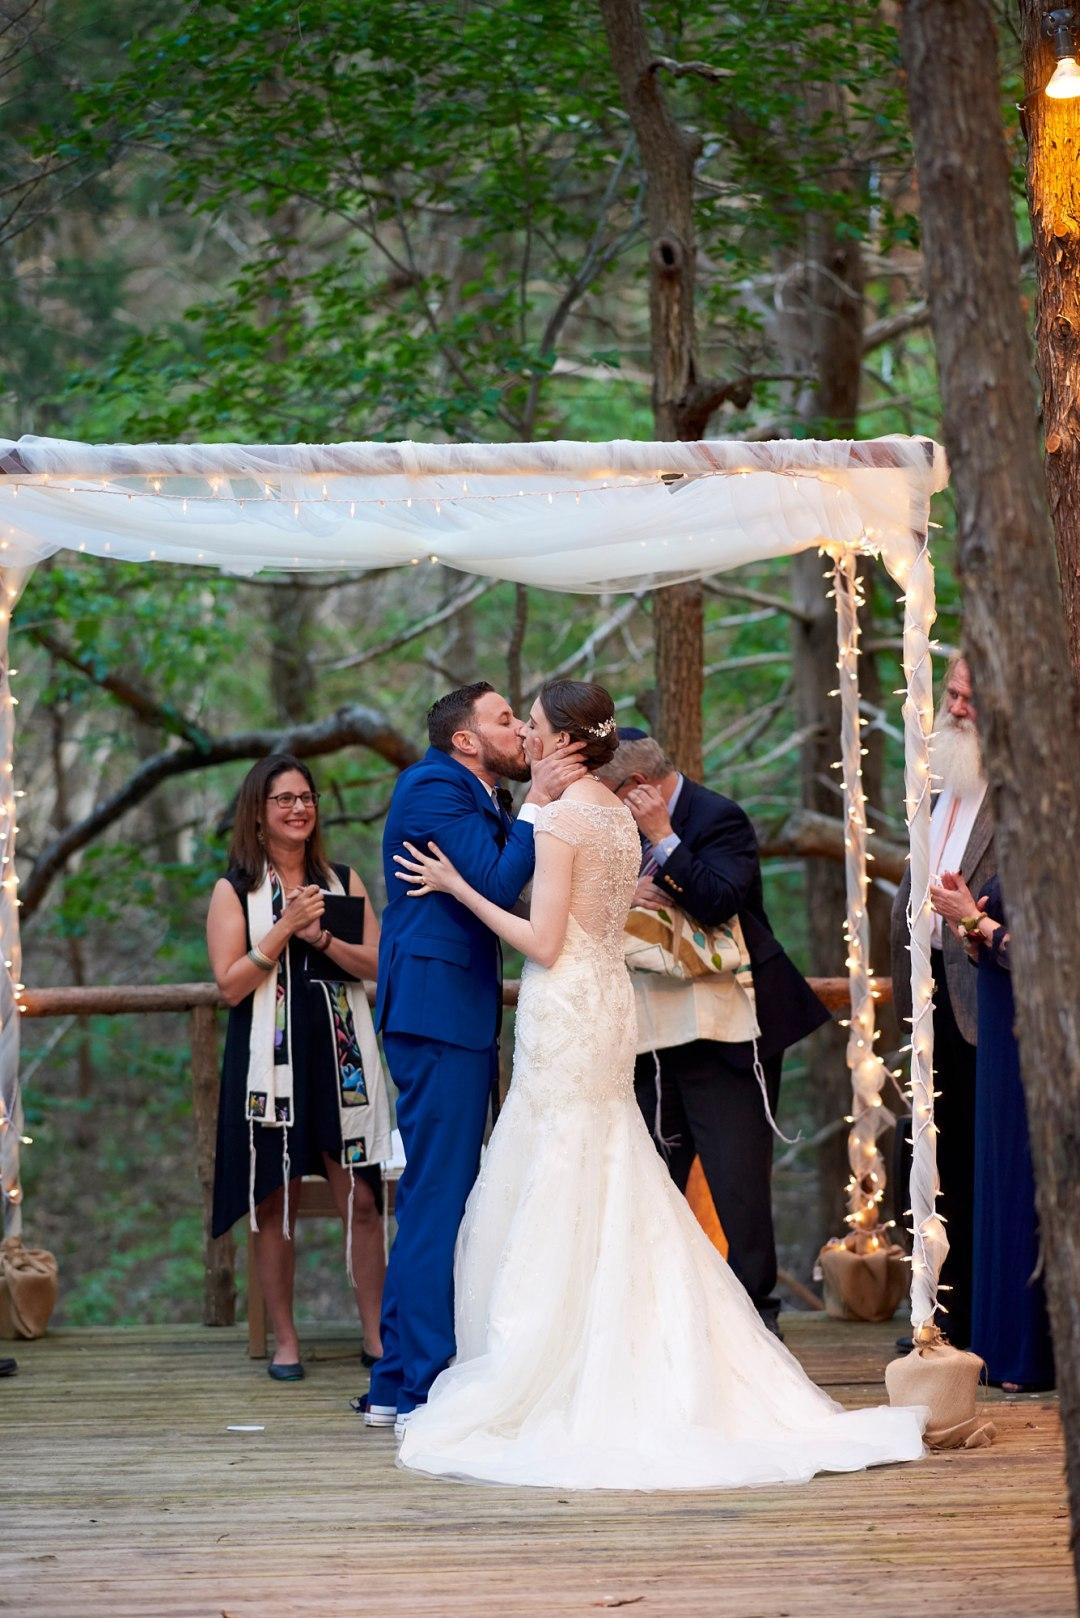 Forest Wedding Ceremony - Waco DIY Wedding - Temple Camp Wedding - Hallie and Jonathan - Green Family Camp - Outdoor Wedding